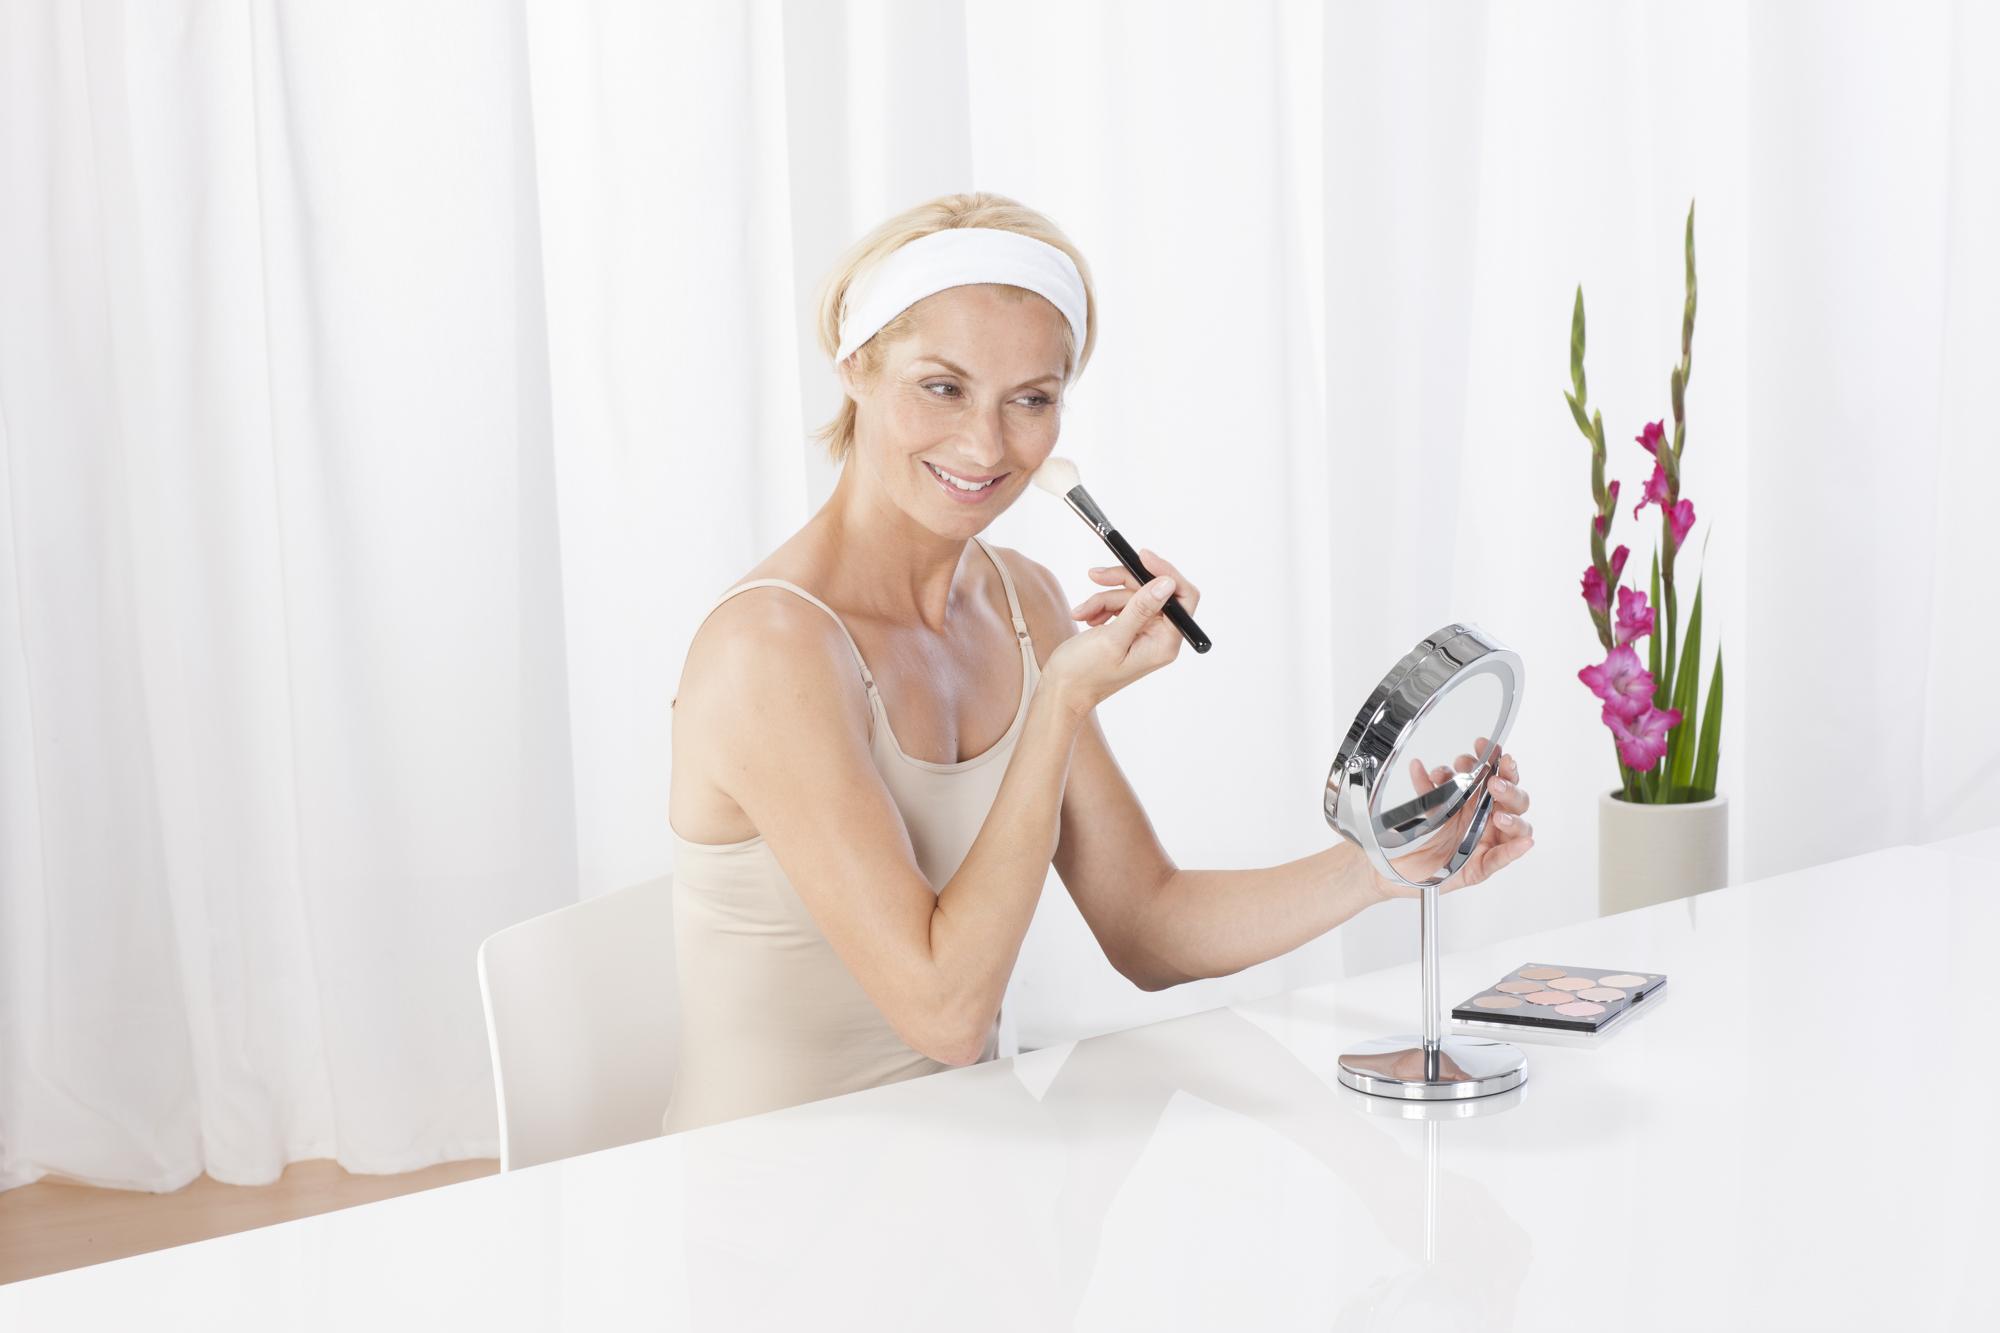 88550_CM_840_Kosmetikspiegel_Anwendung.j